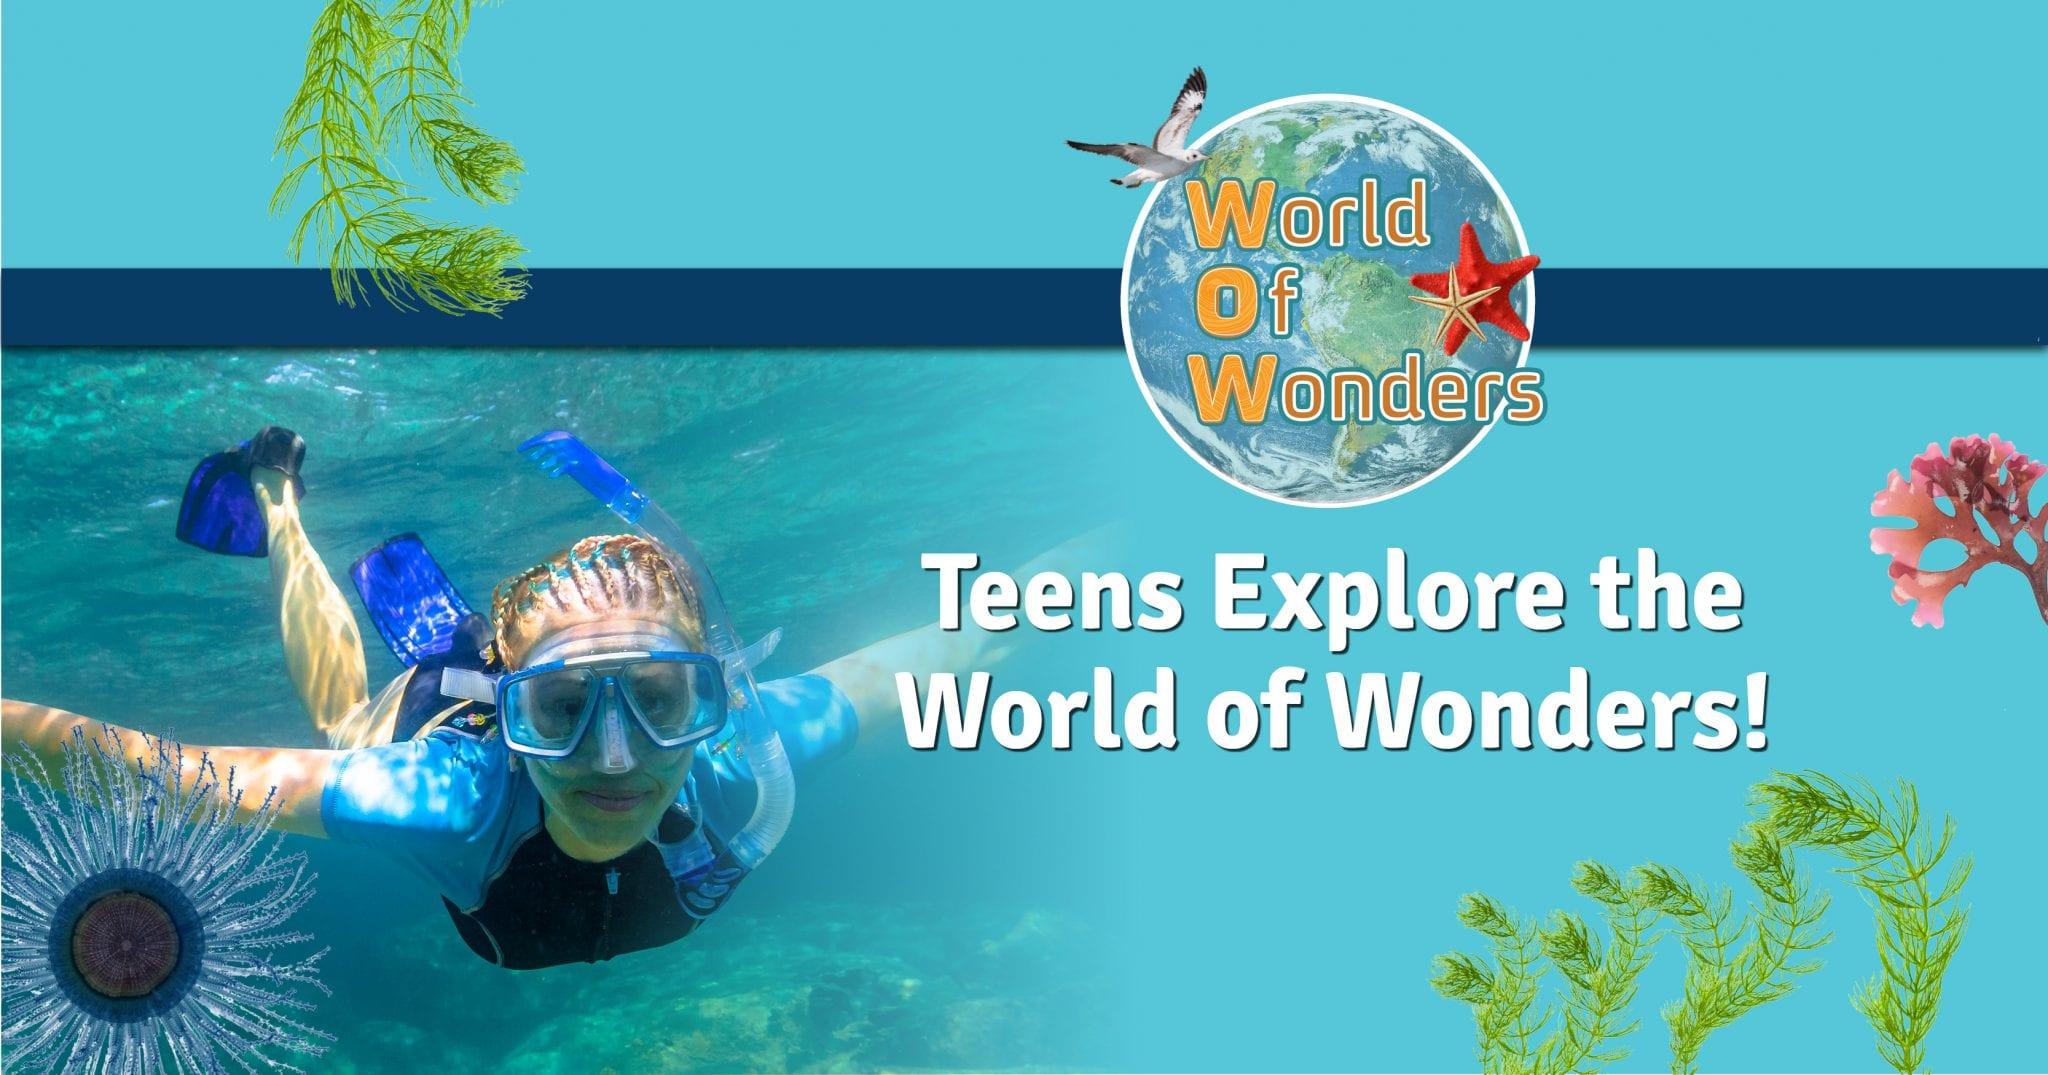 World of Wonders (WoW)